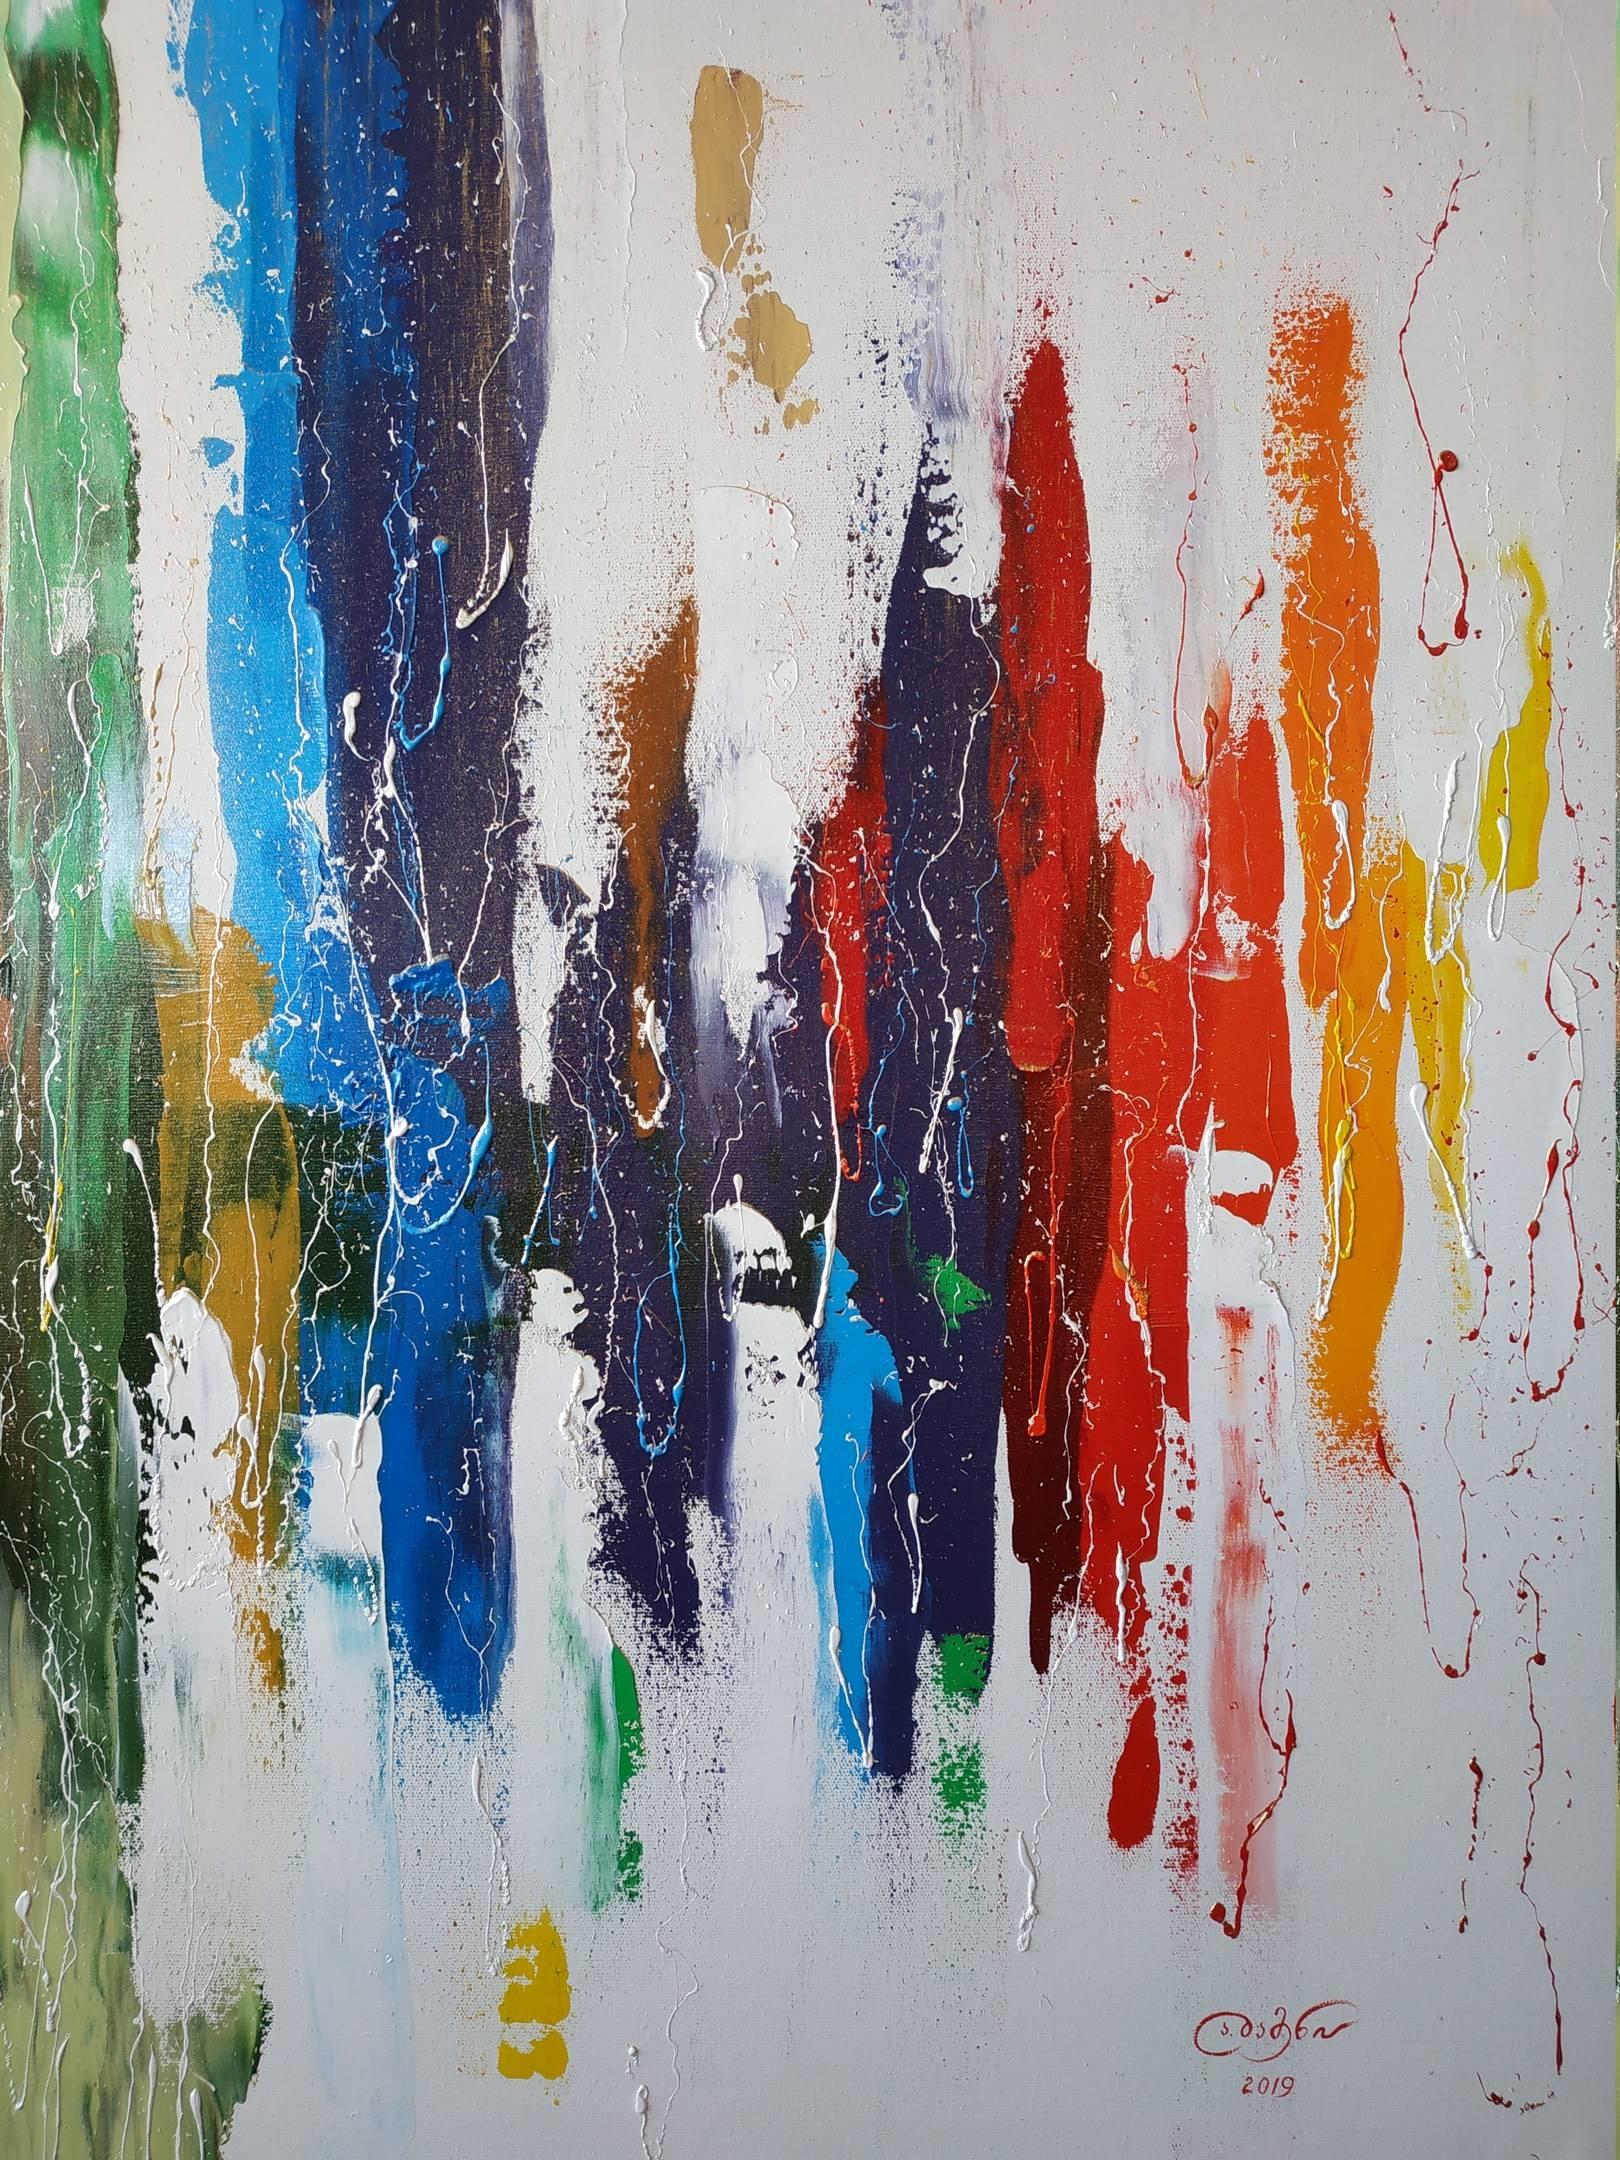 «Звуковая волна»  холст, масло «Sound wave»  oil on canvas  90x70,  2019